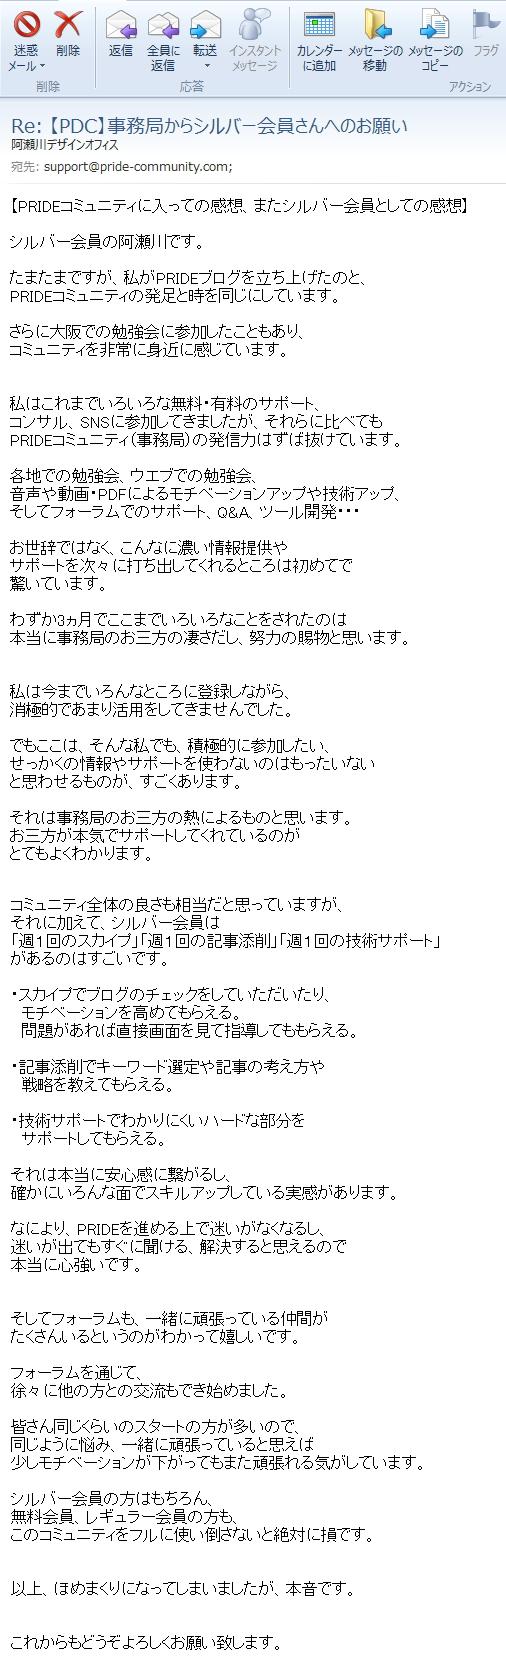 PDCシルバー会員 感想 阿瀬川さん